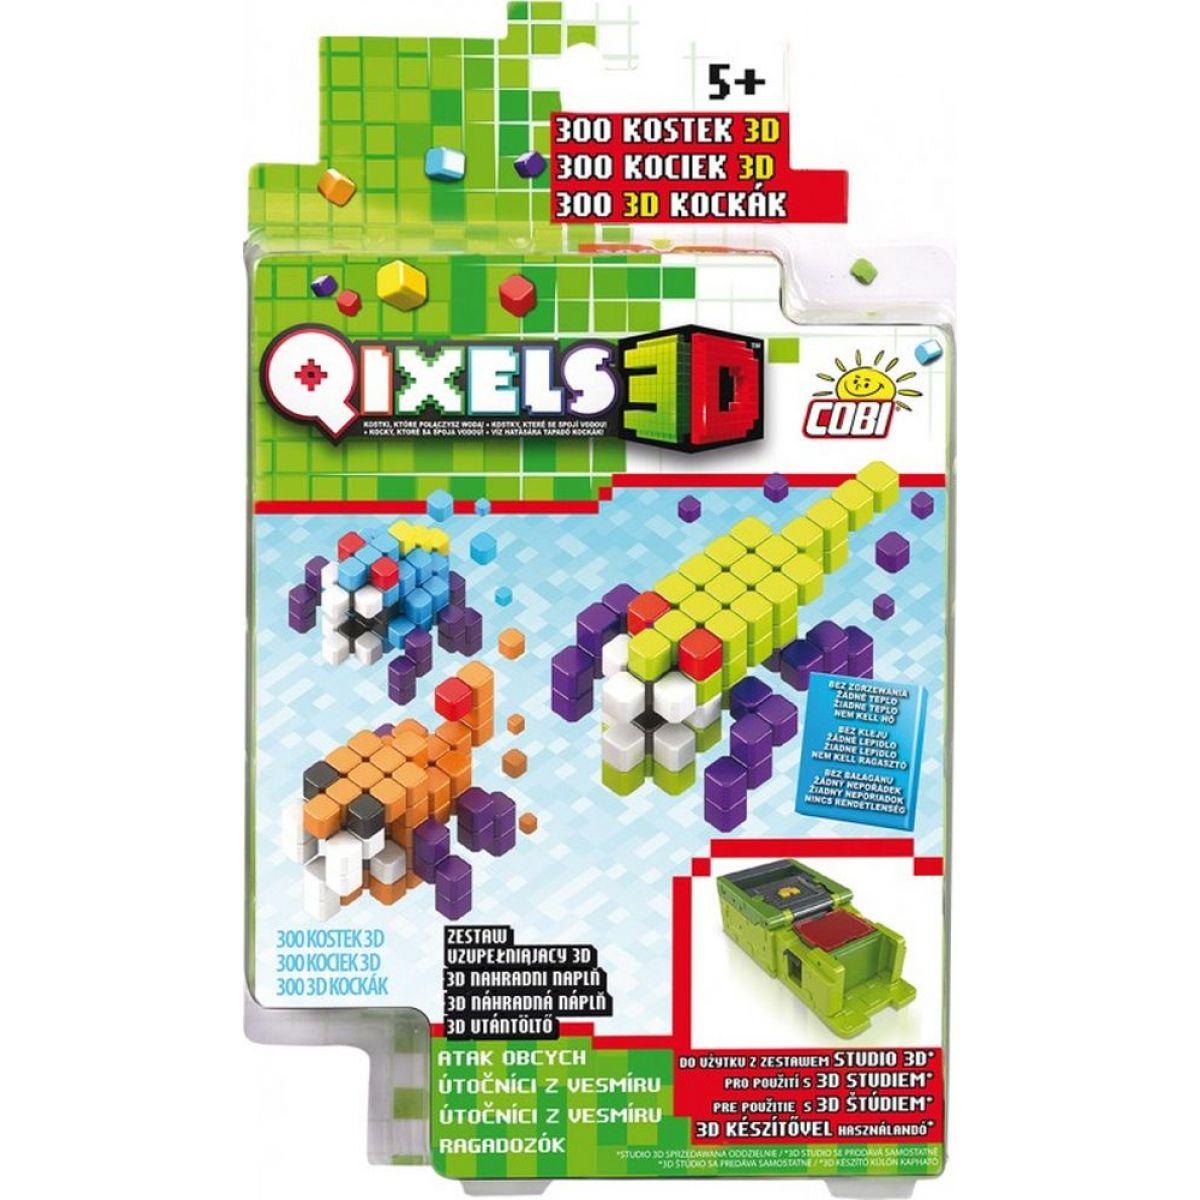 Qixels 3D Tematická sada Útočníci z vesmíru